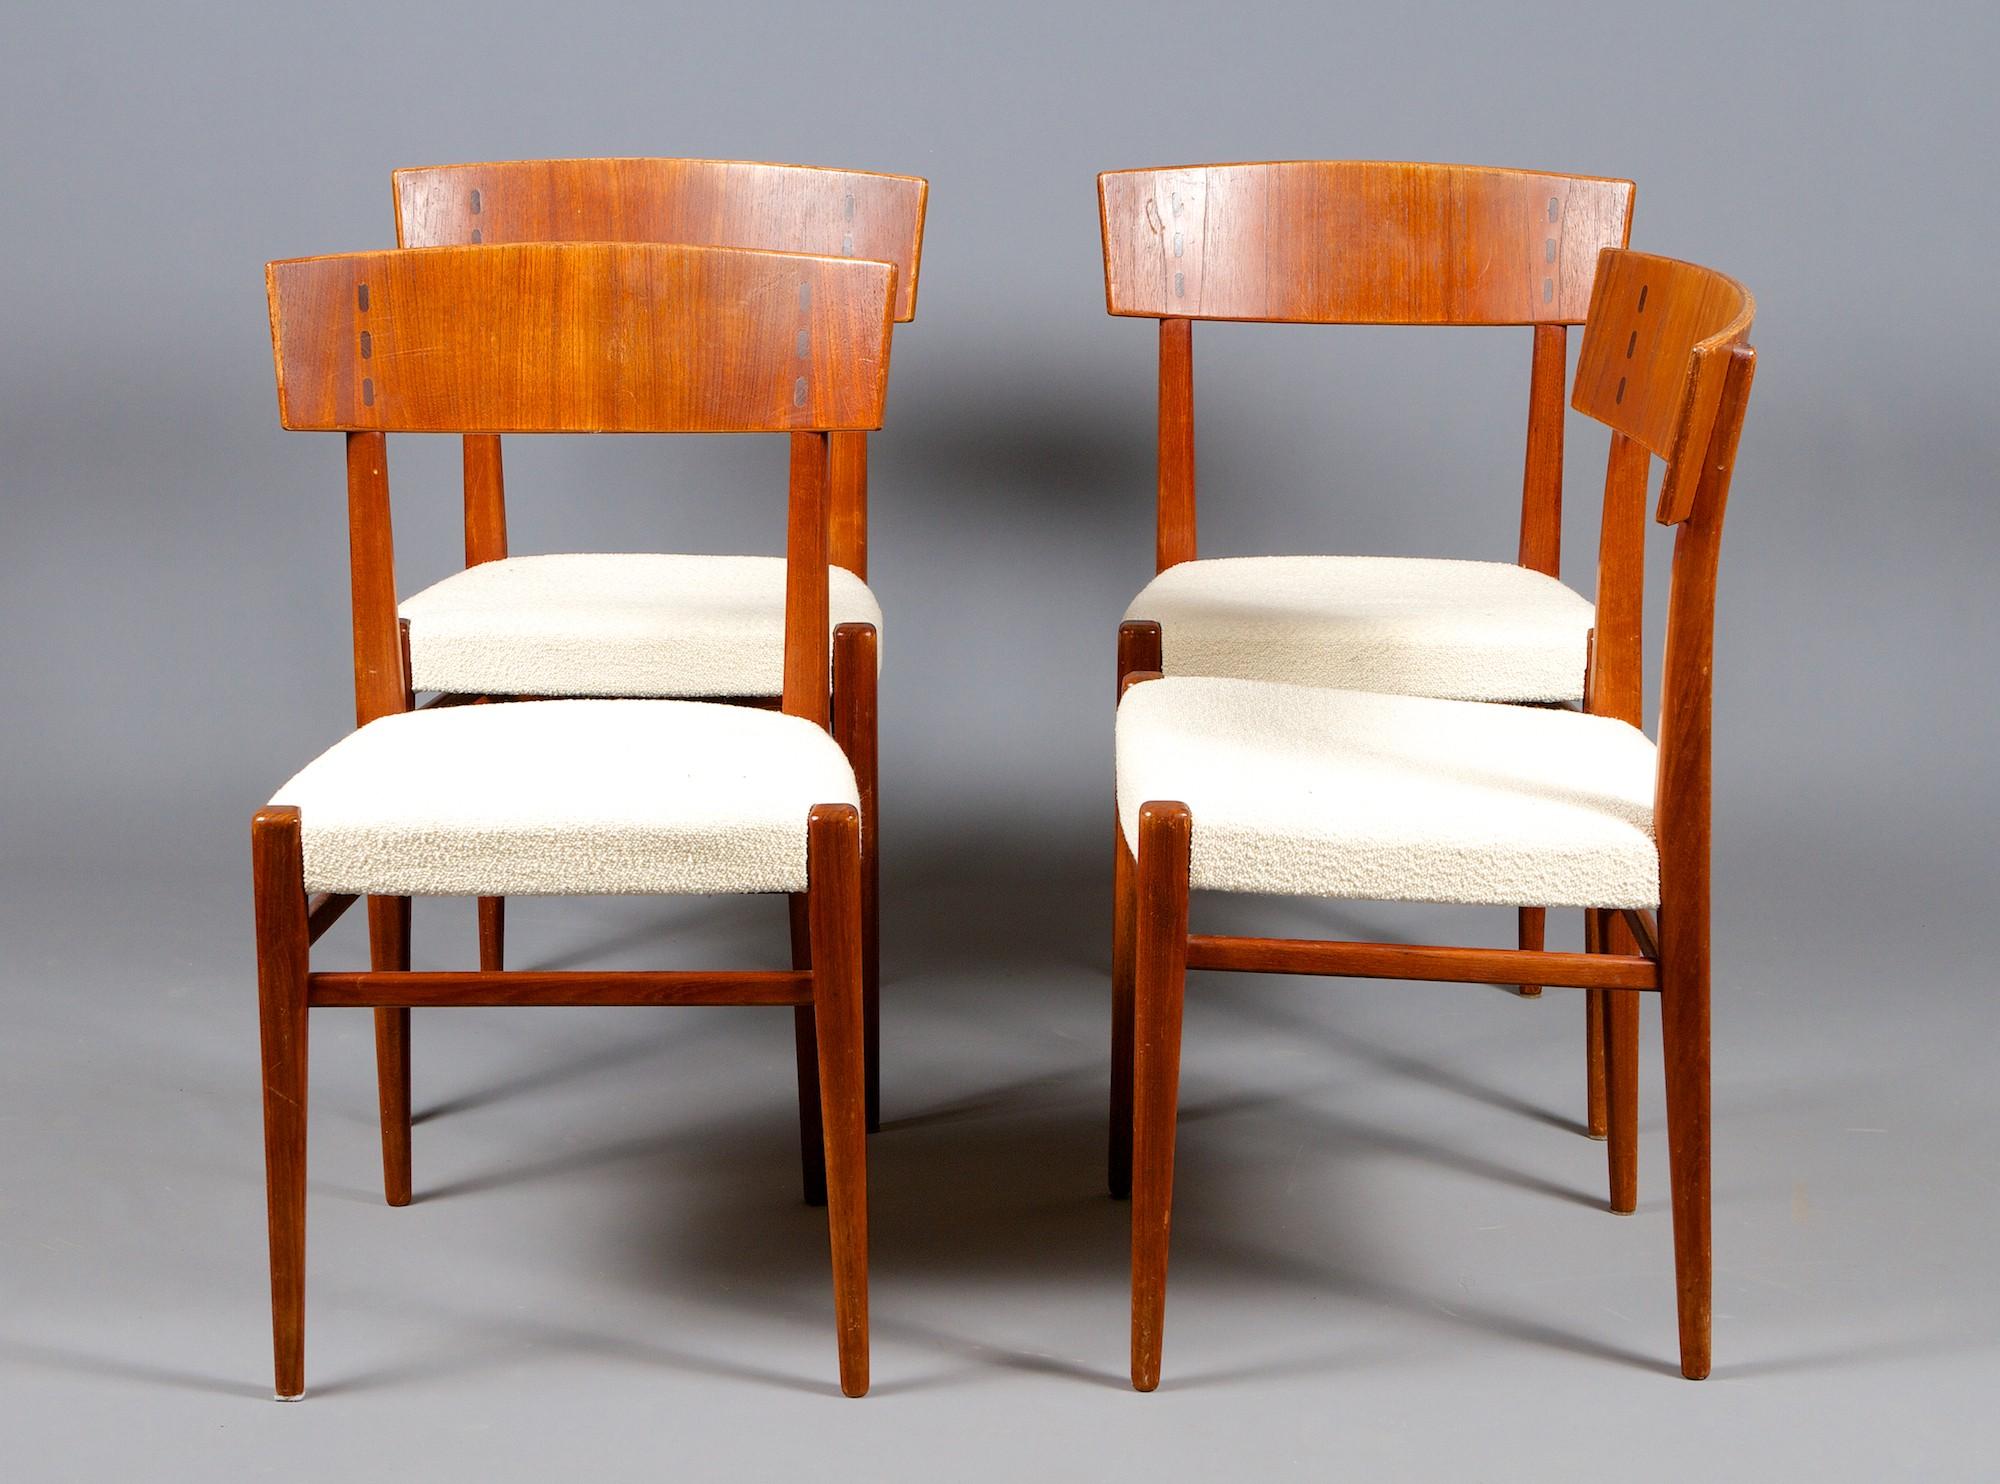 Chairs, 4 pcs